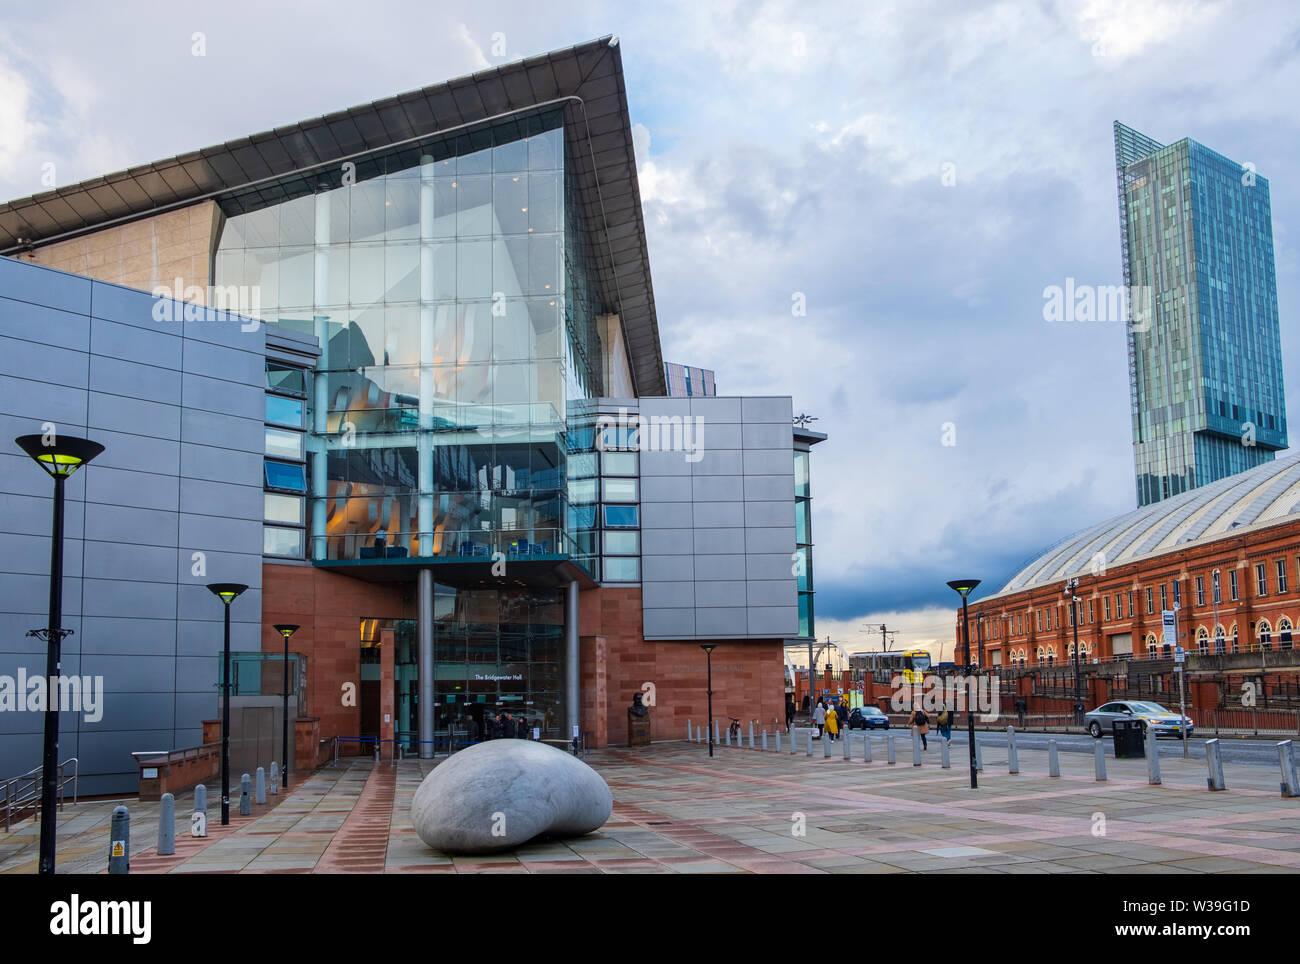 Manchester, Großbritannien - 25 April 2019: Der Bridgewater Hall in Manchester Central Conference Center. Der Bridgewater Hall ist ein Internat Stockfoto